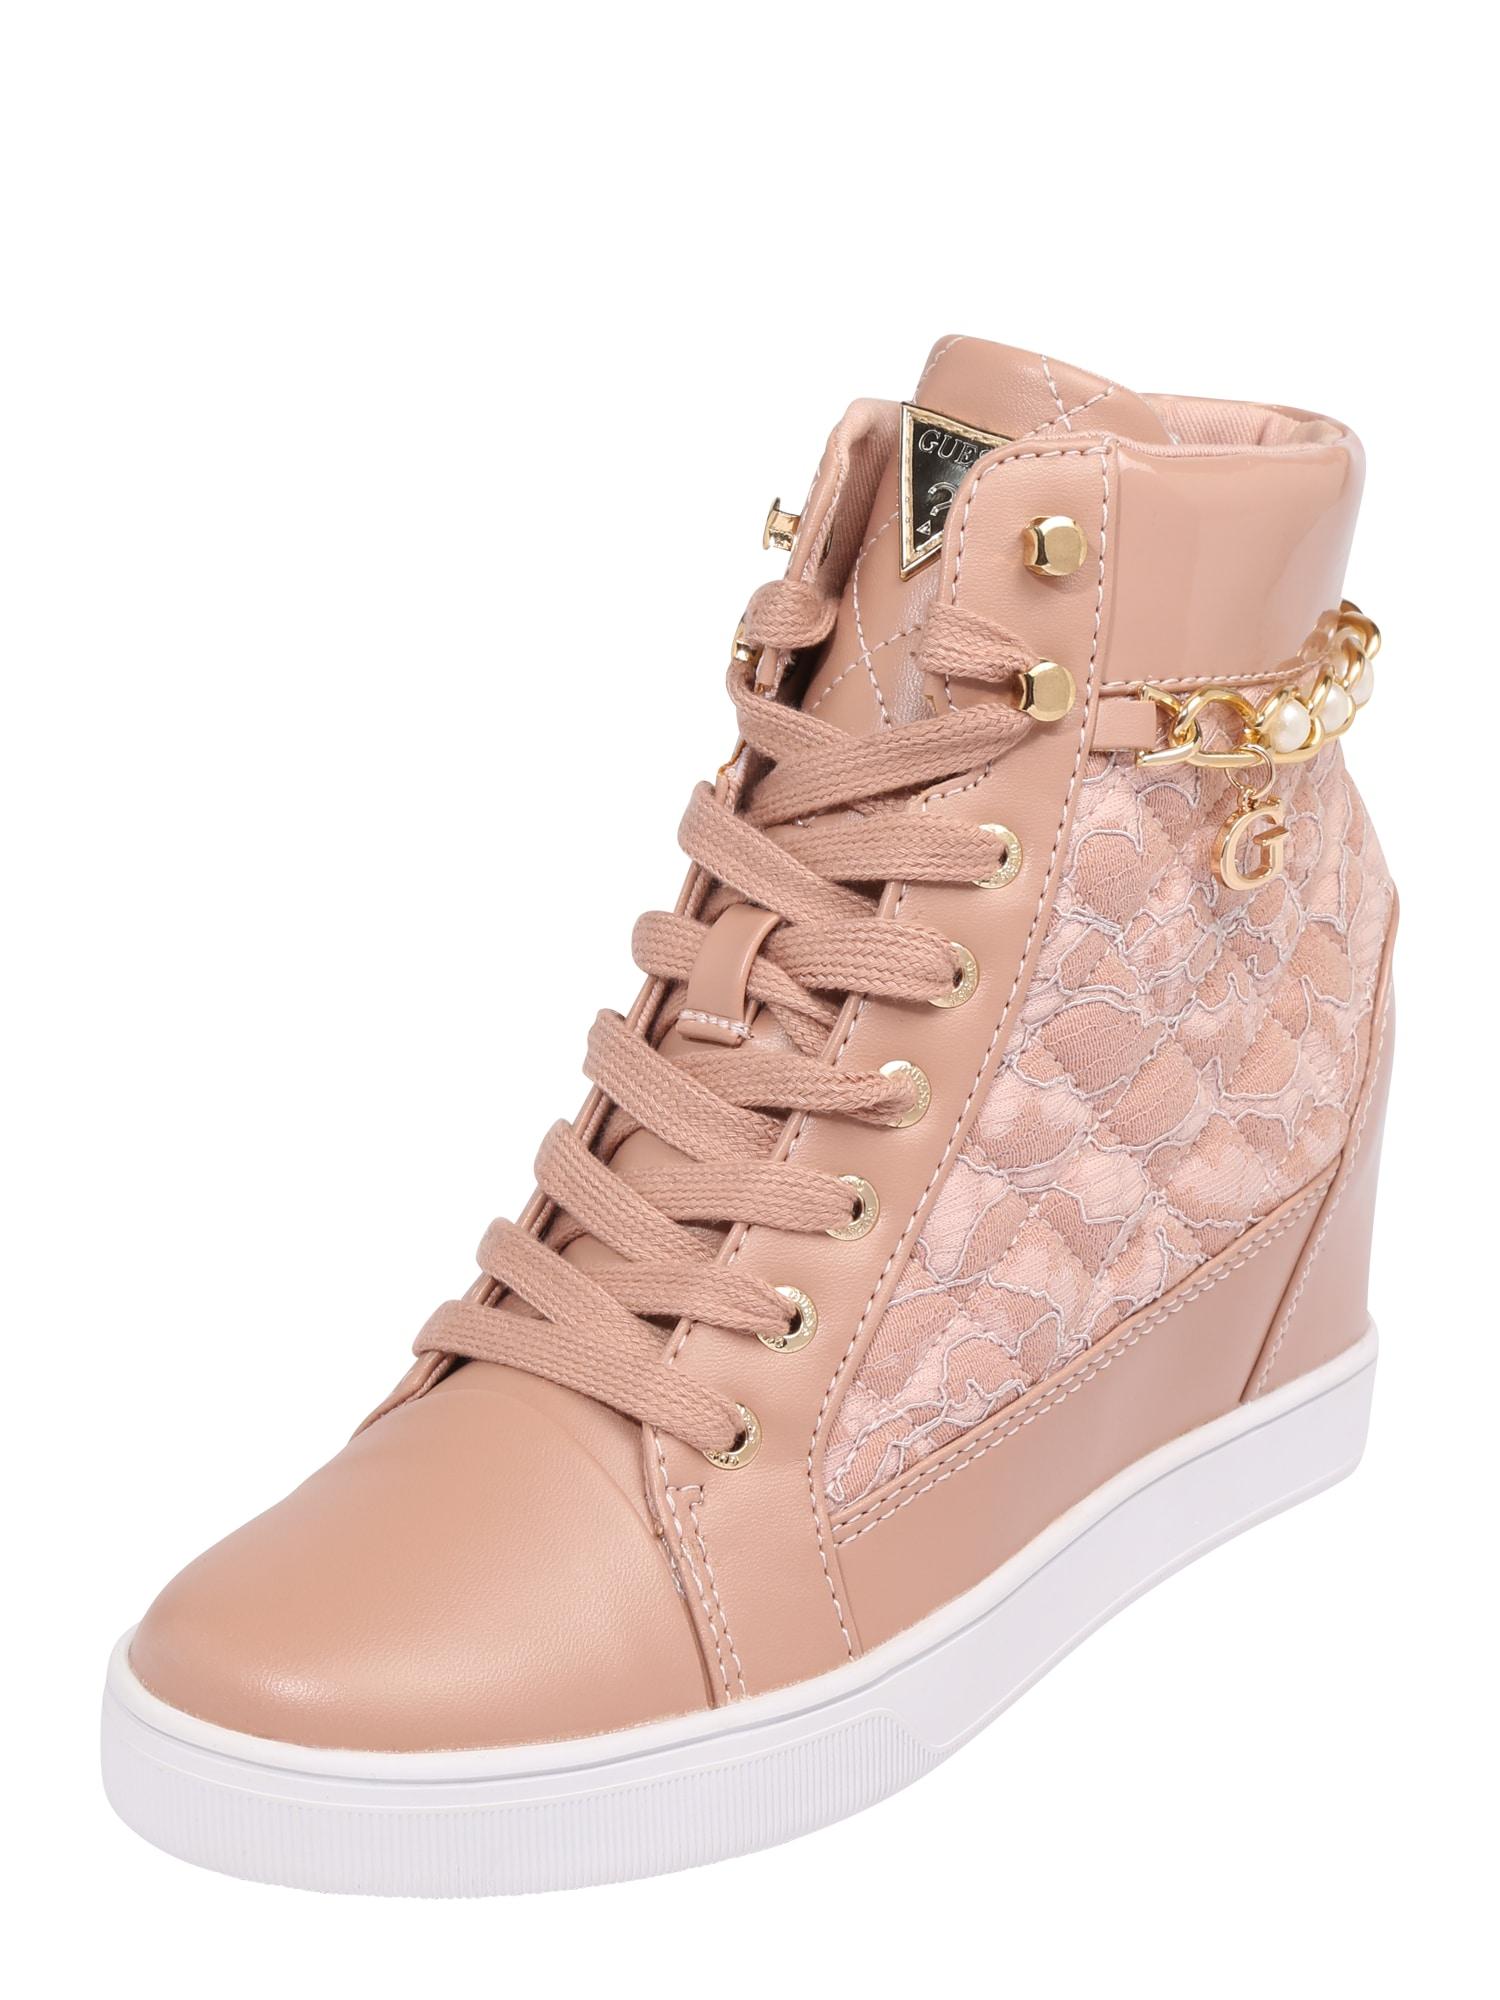 GUESS Damen Sneaker Active Lady rosa | 00190359695191